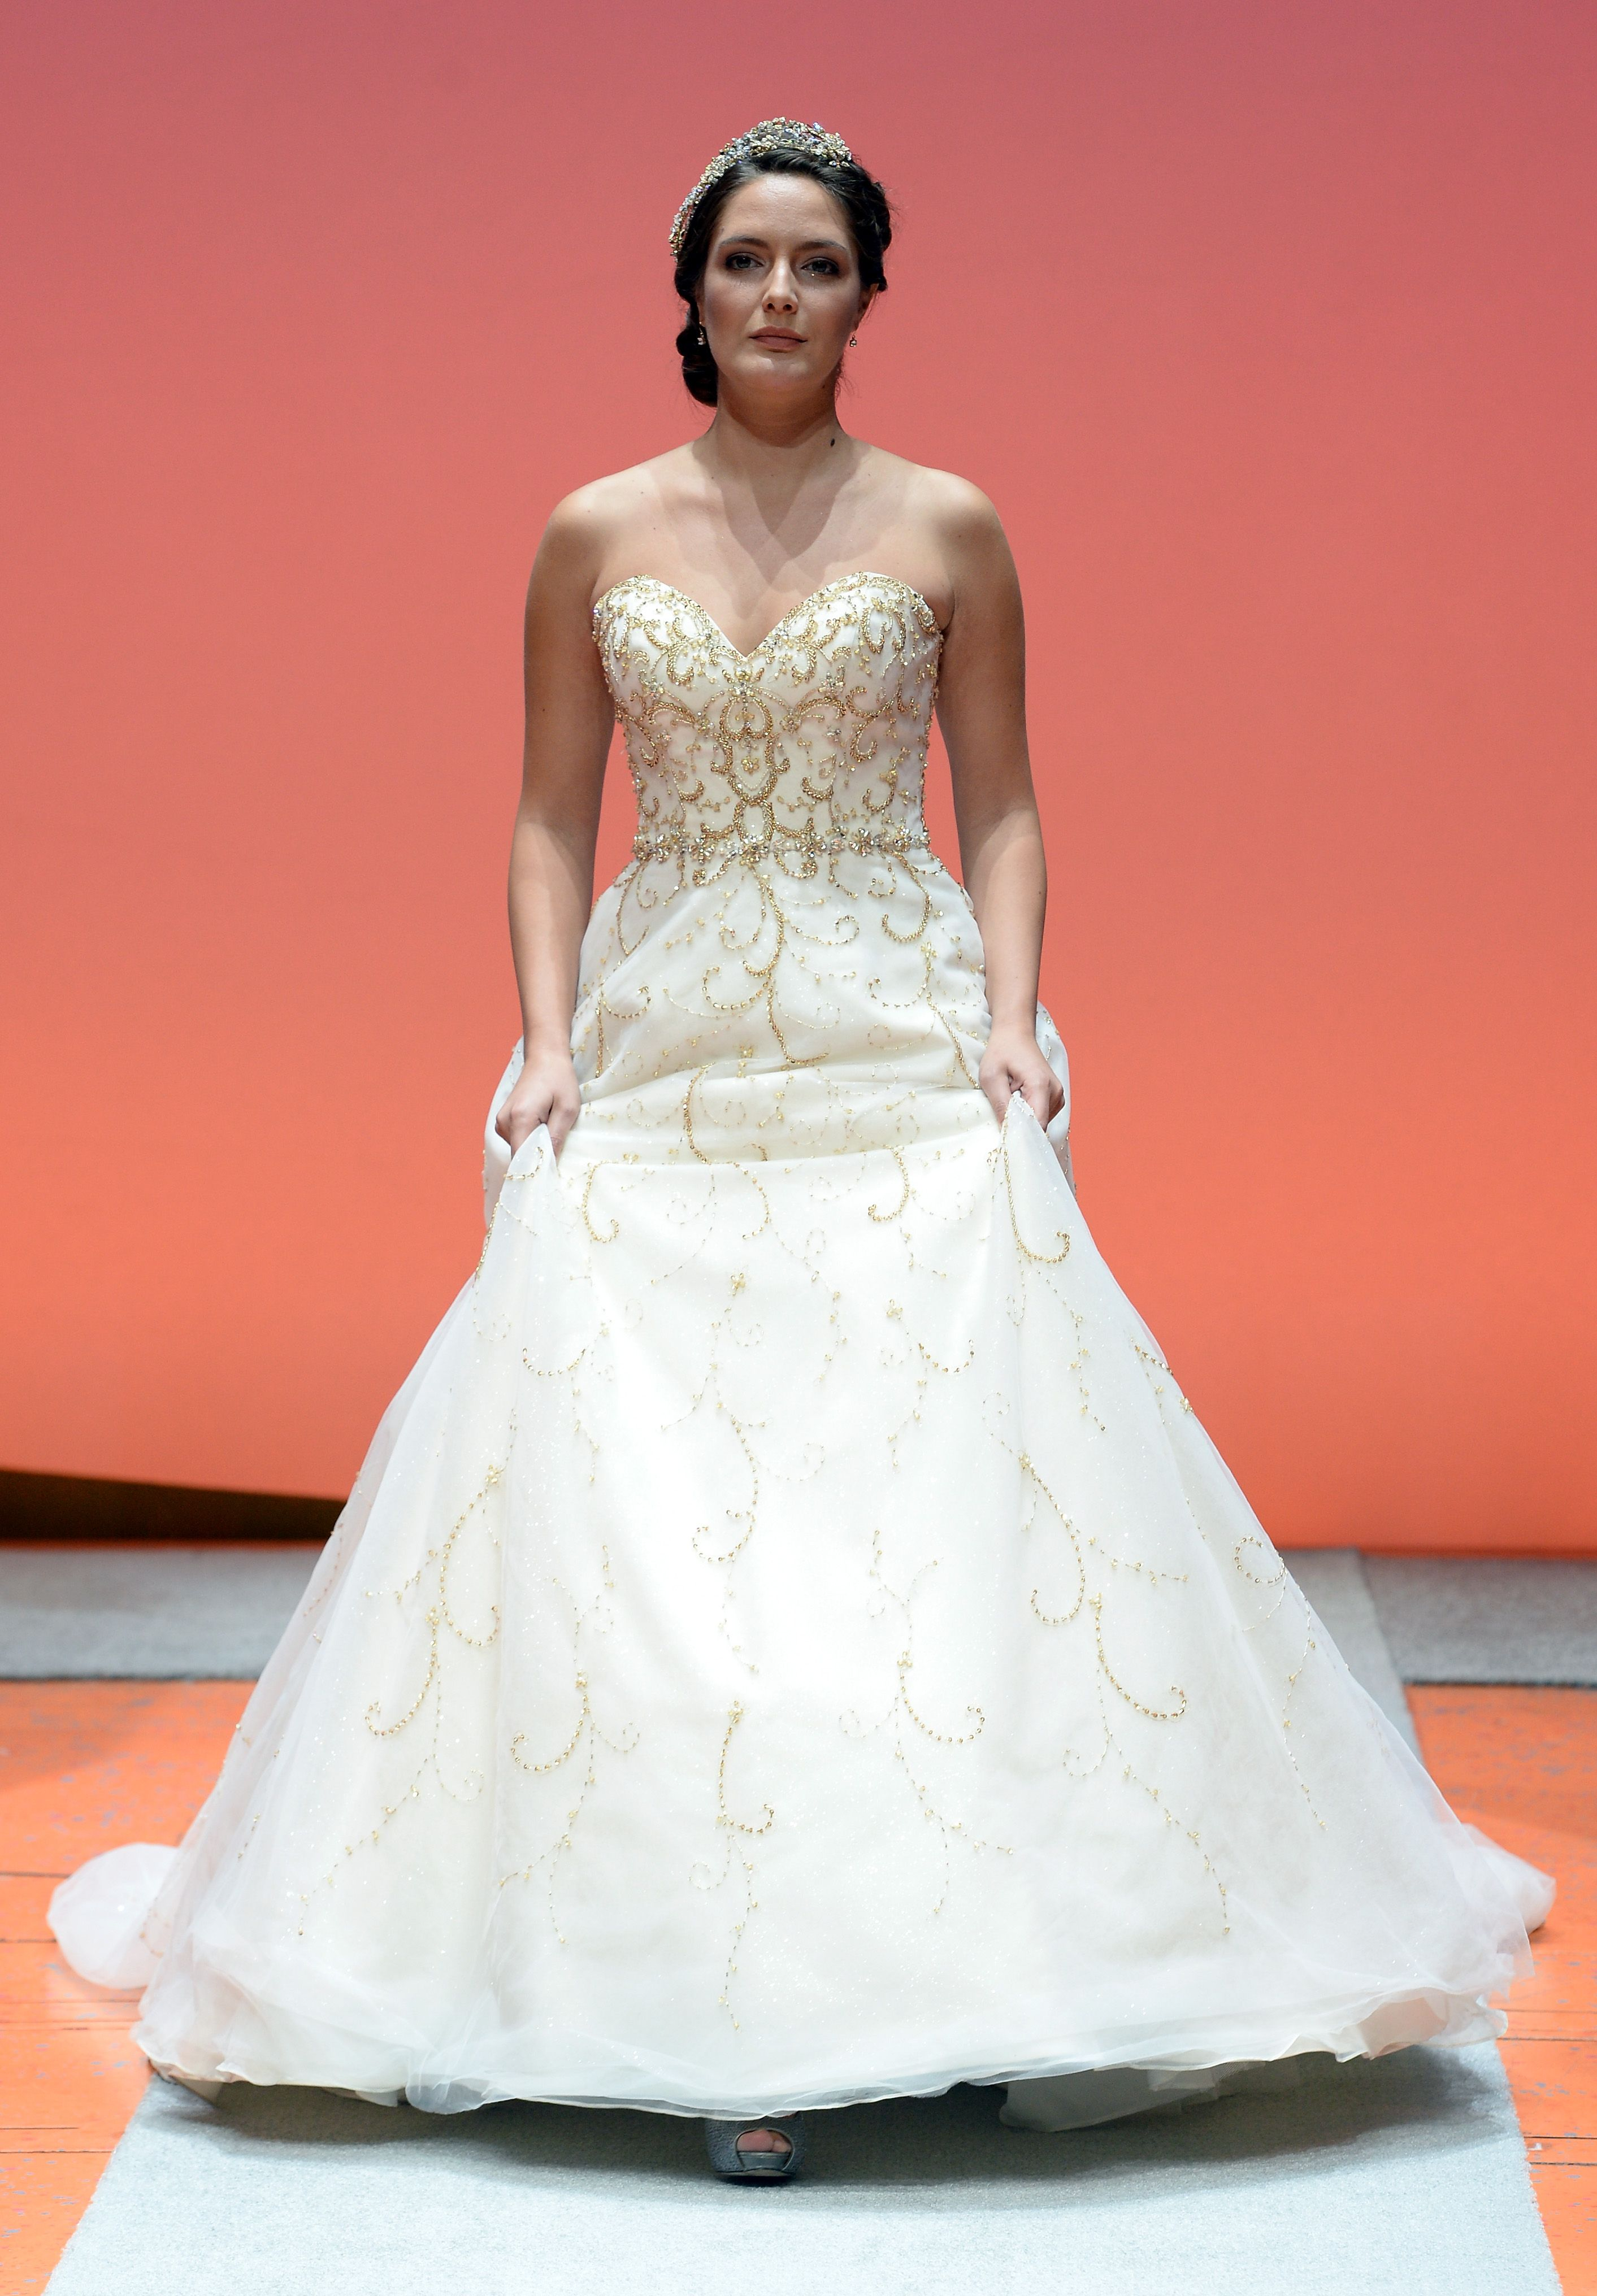 Wedding cinderella dresses pinterest